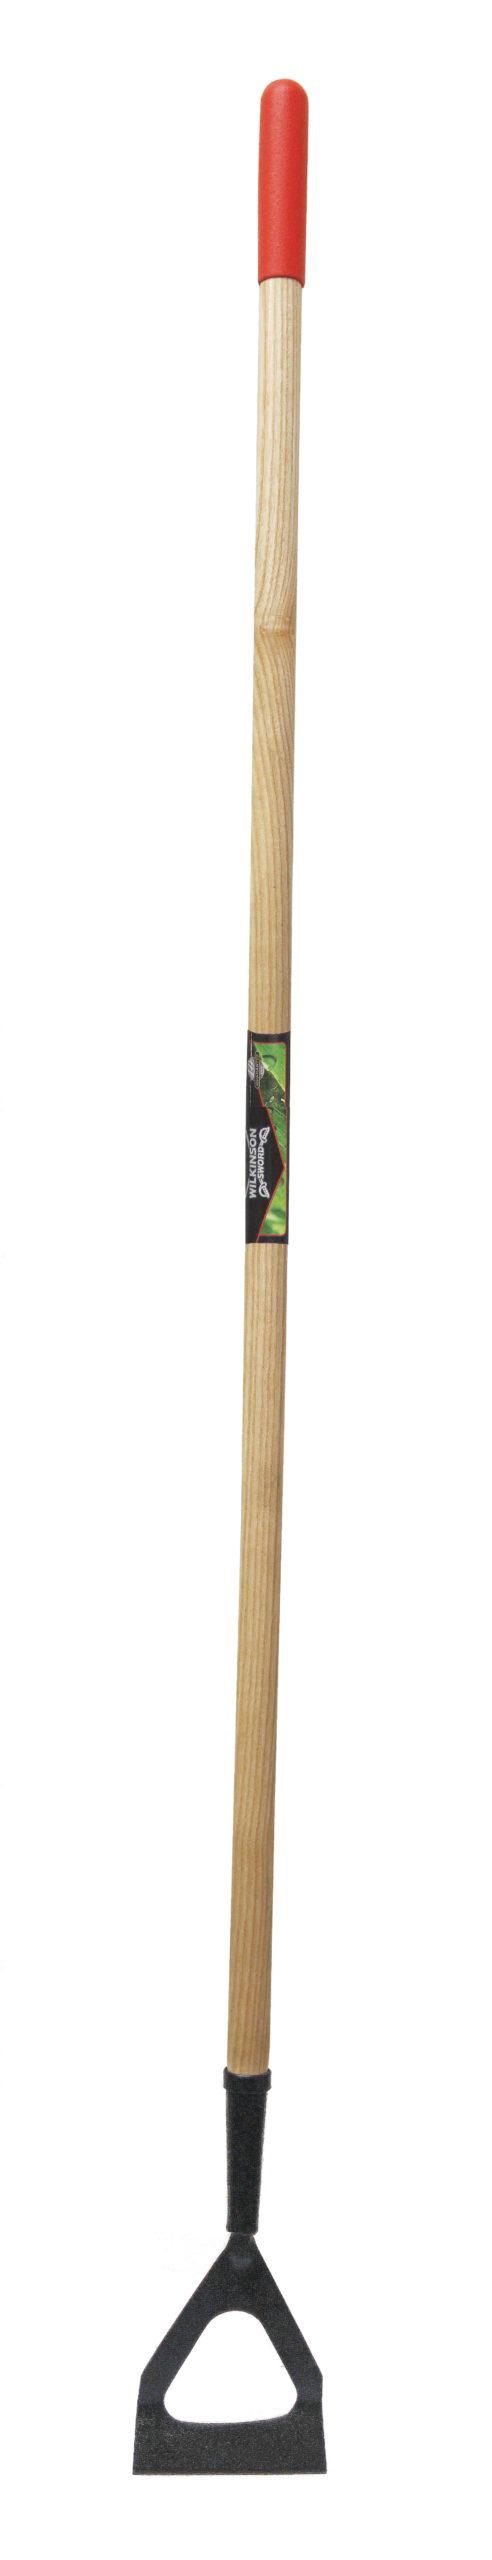 Wilkinson Sword Carbon Steel Dutch Hoe